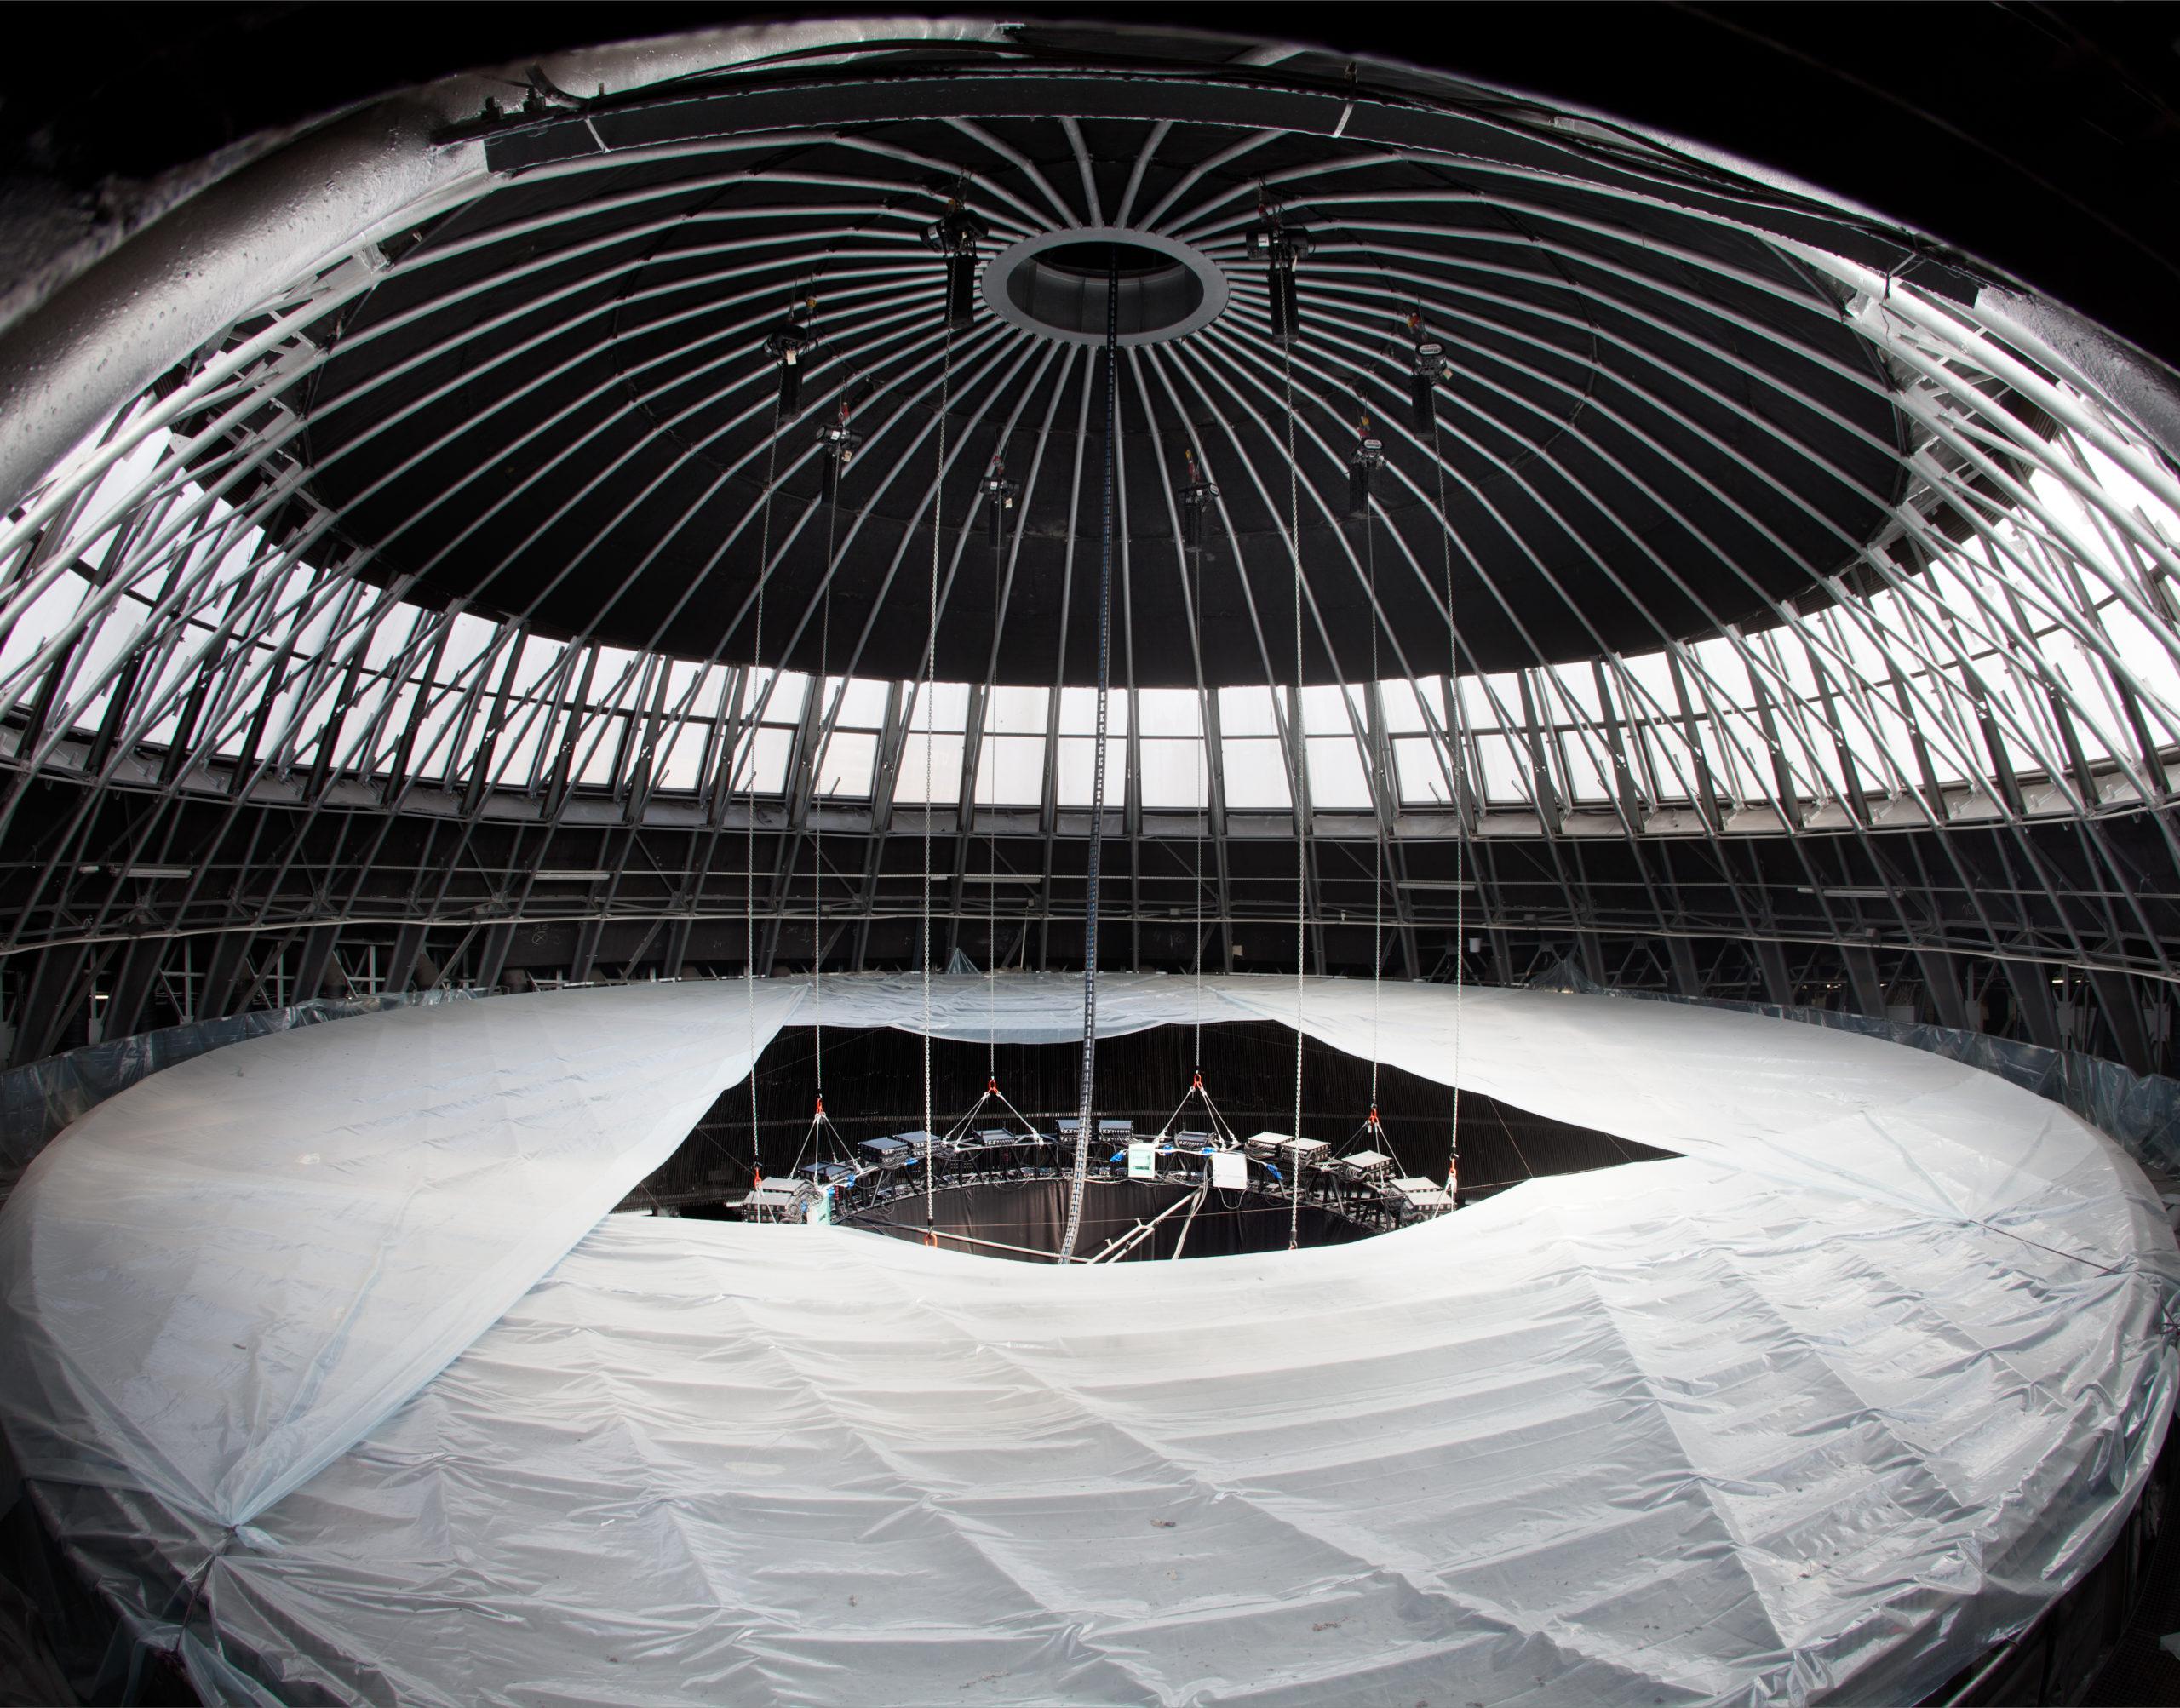 Sporthalle Katowice: Kettenzuganlage